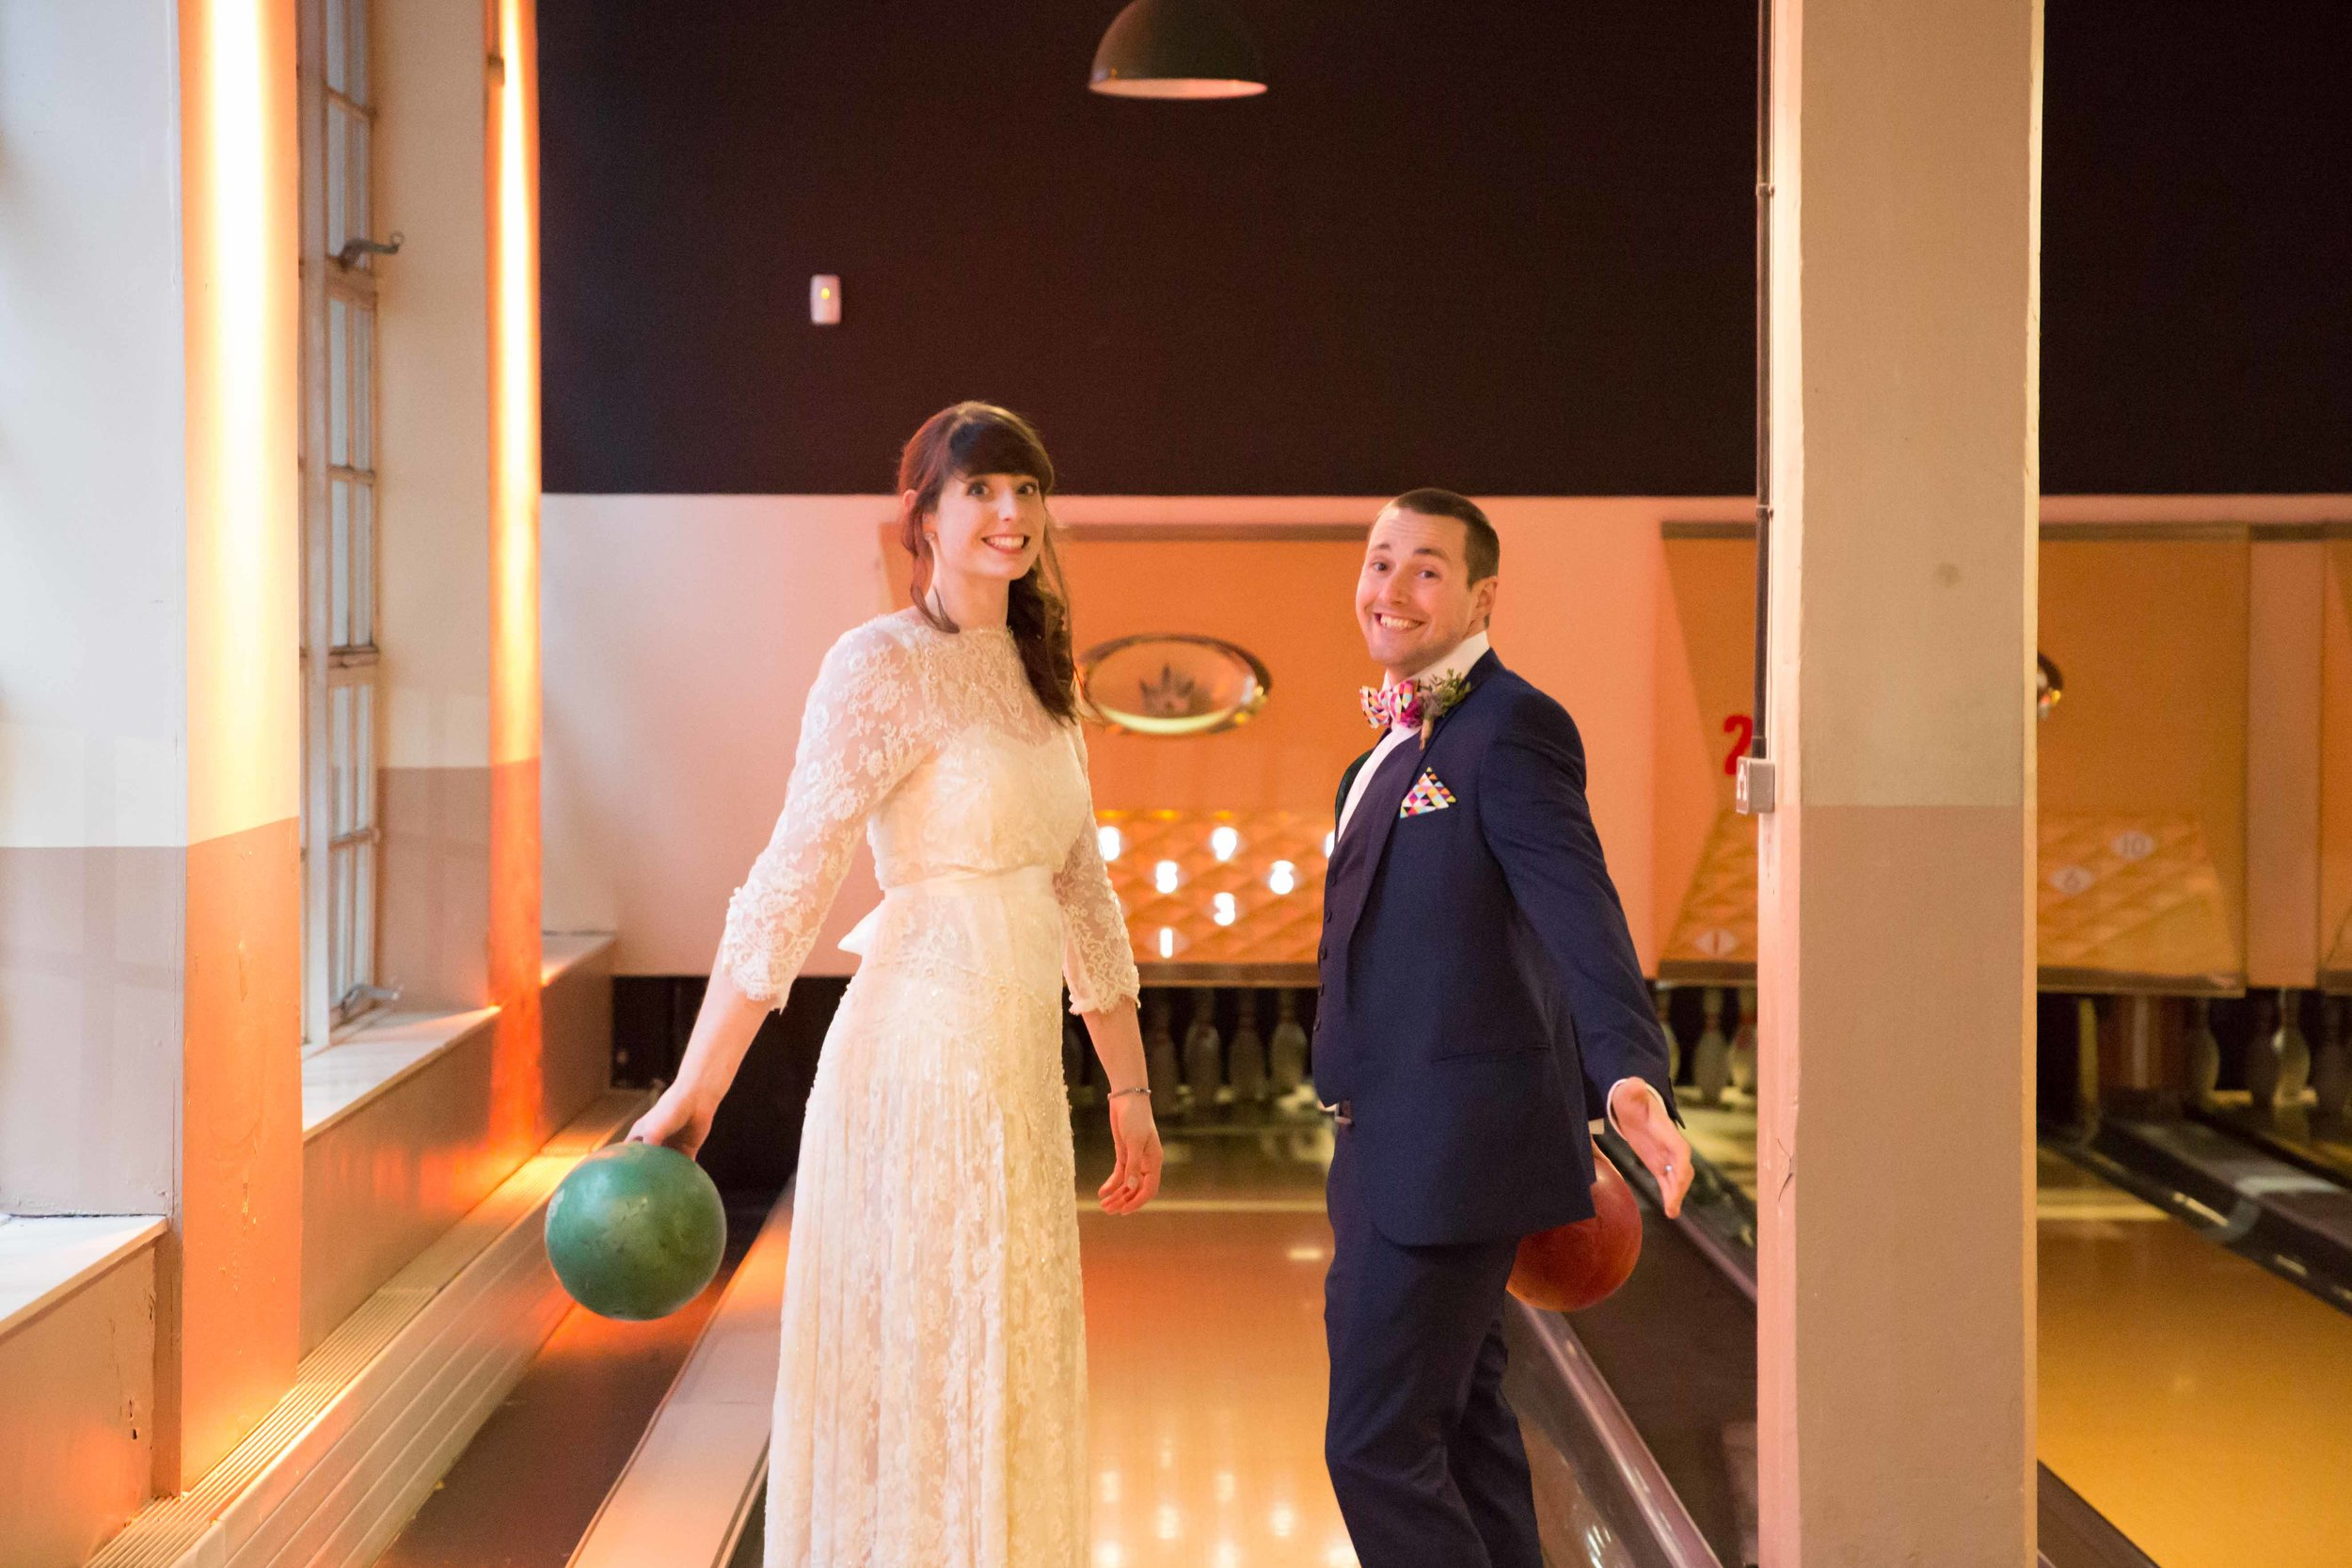 Adam & Faye - Wright Wedding Photography - Bristol Wedding Photographer -316.jpg